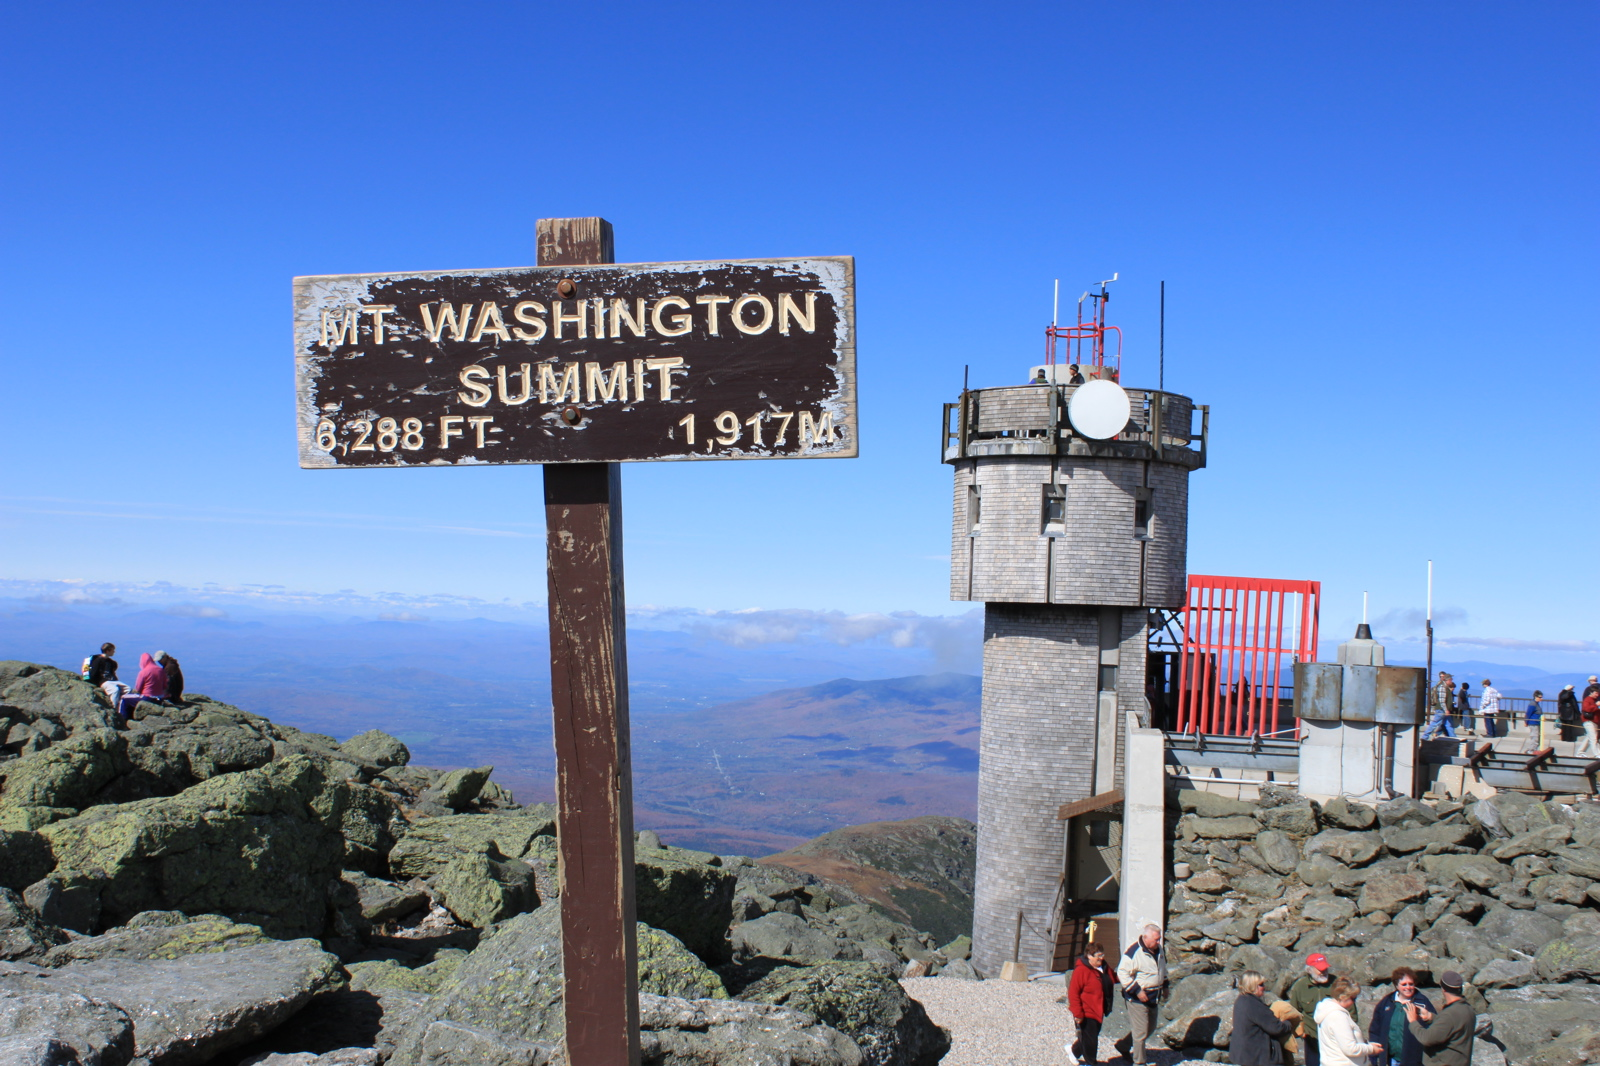 Mount Washington Observatory - White Mountains, New Hampshire